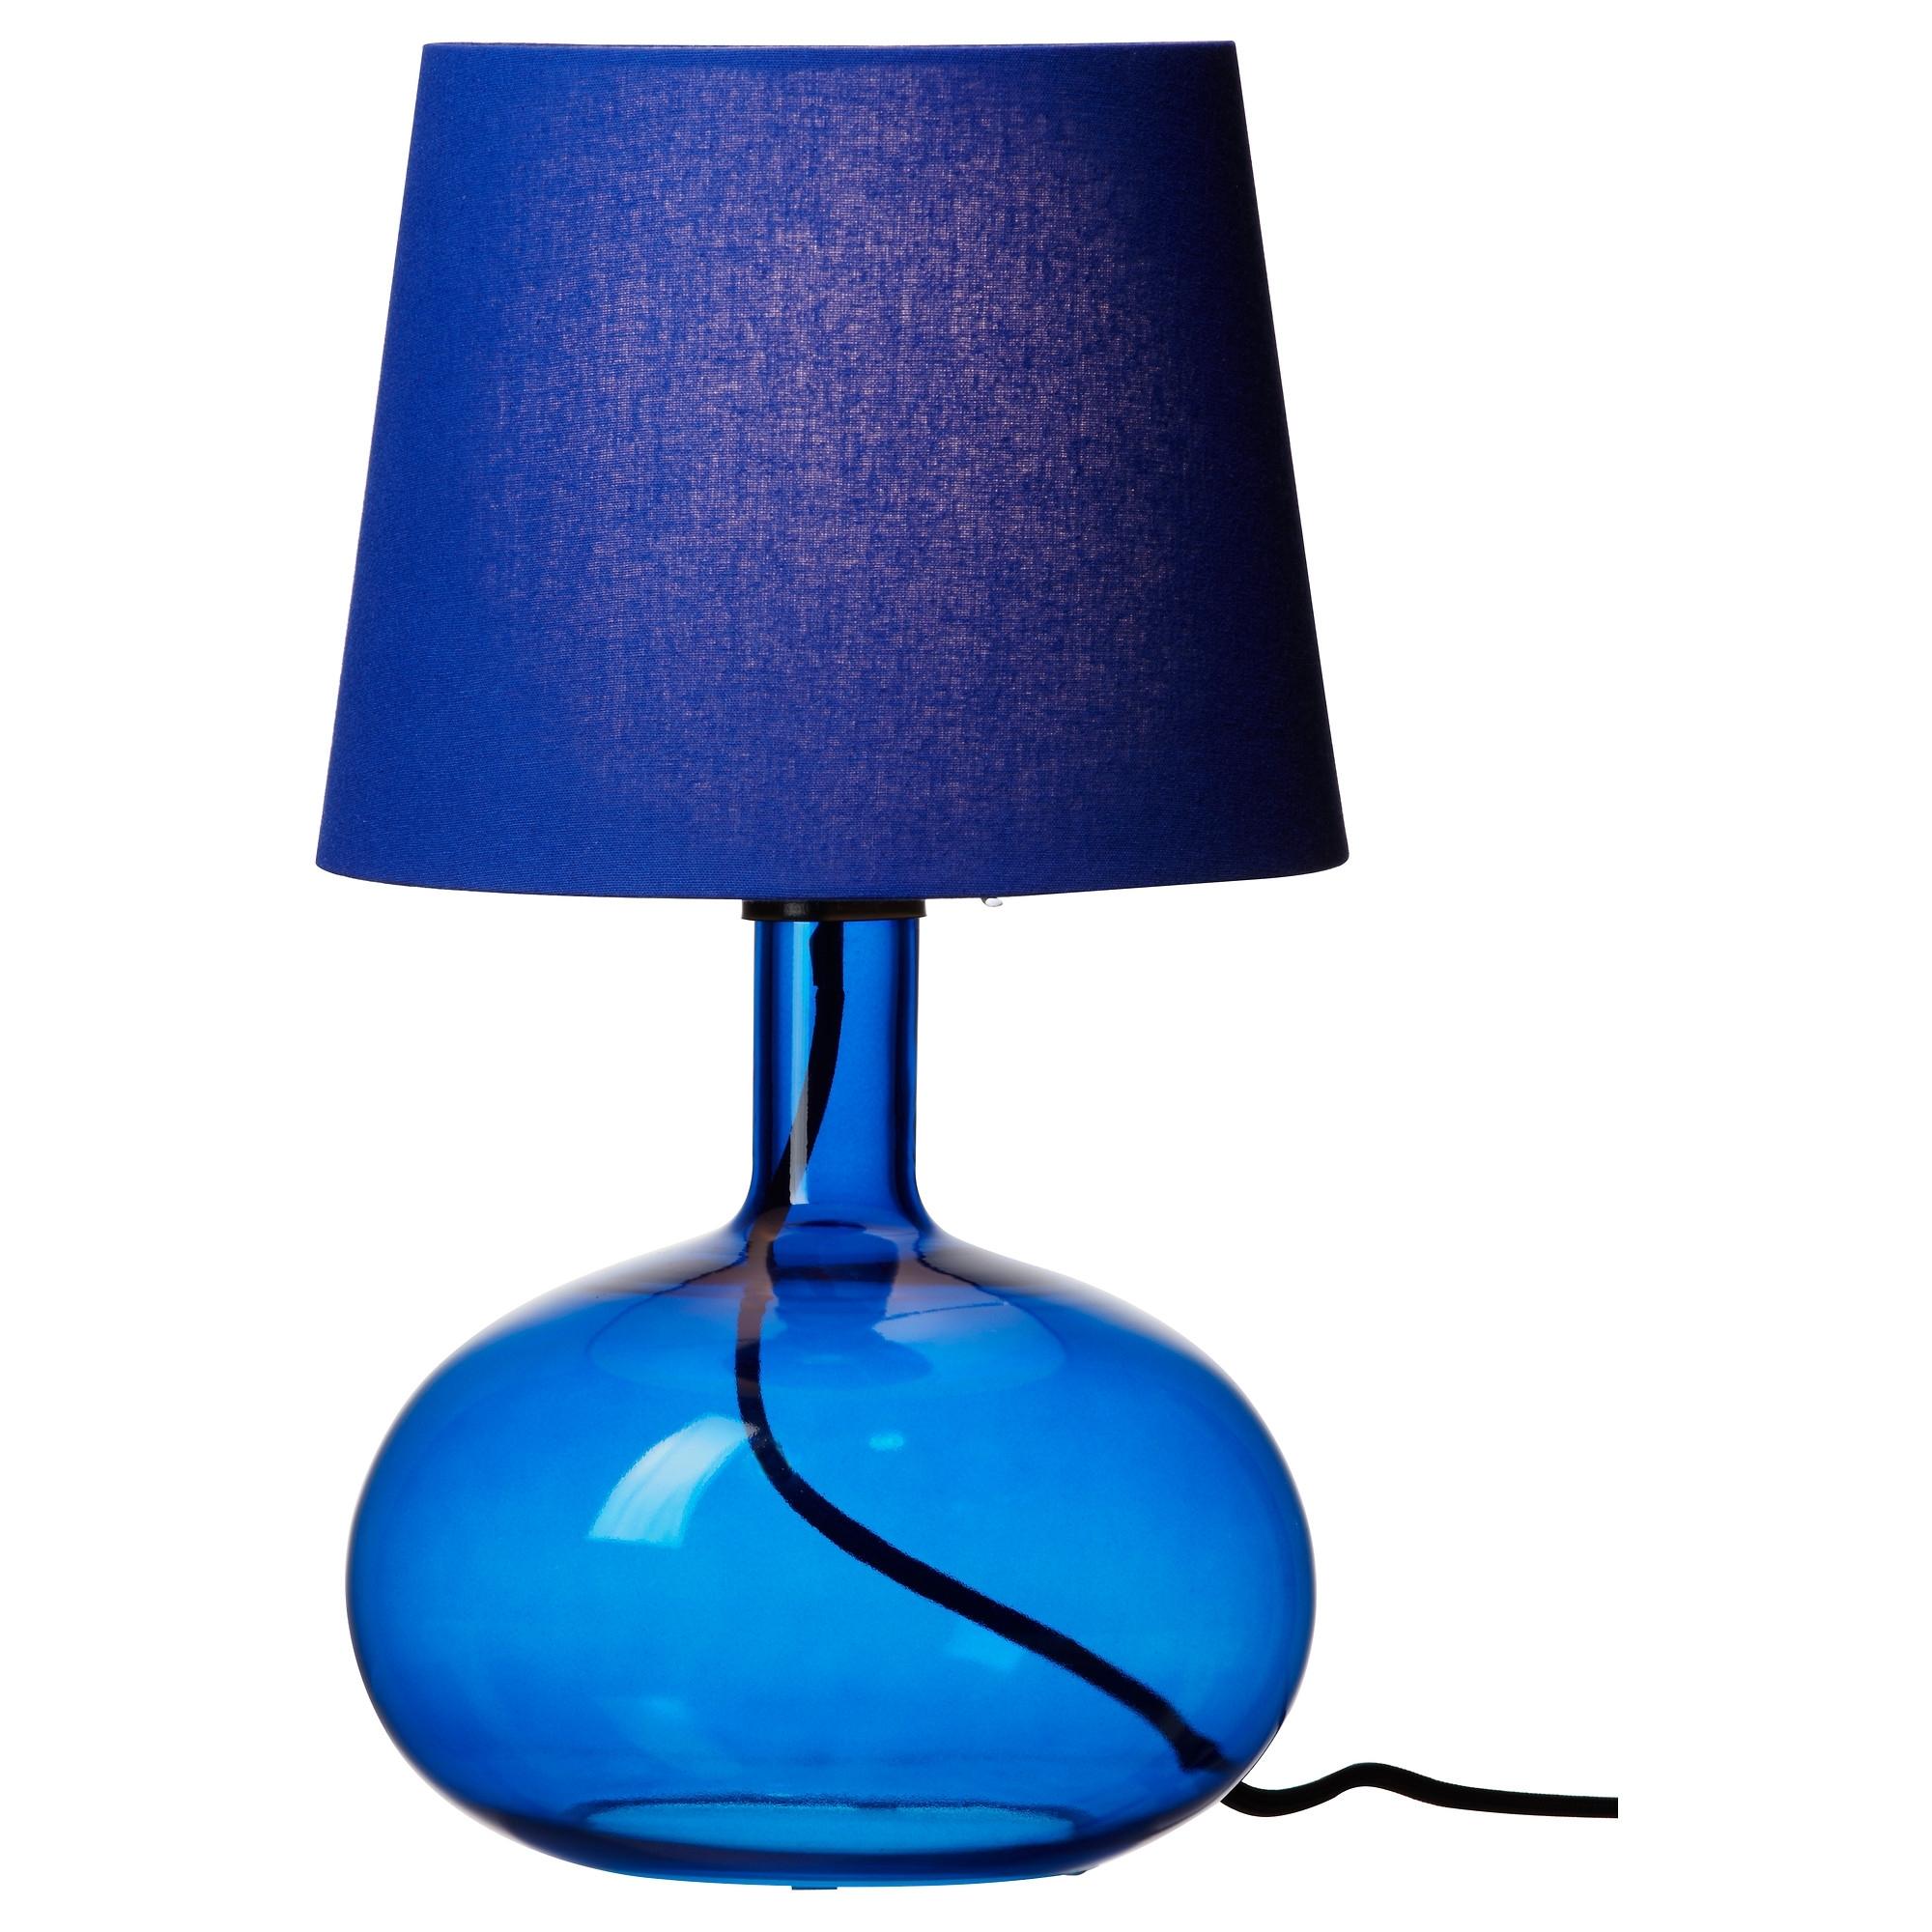 Ljusås Uvås Table Lamp – Ikea | Shoplinkz, Home | Shoplinkz, Lights For Living Room Table Lamps At Ikea (#9 of 15)